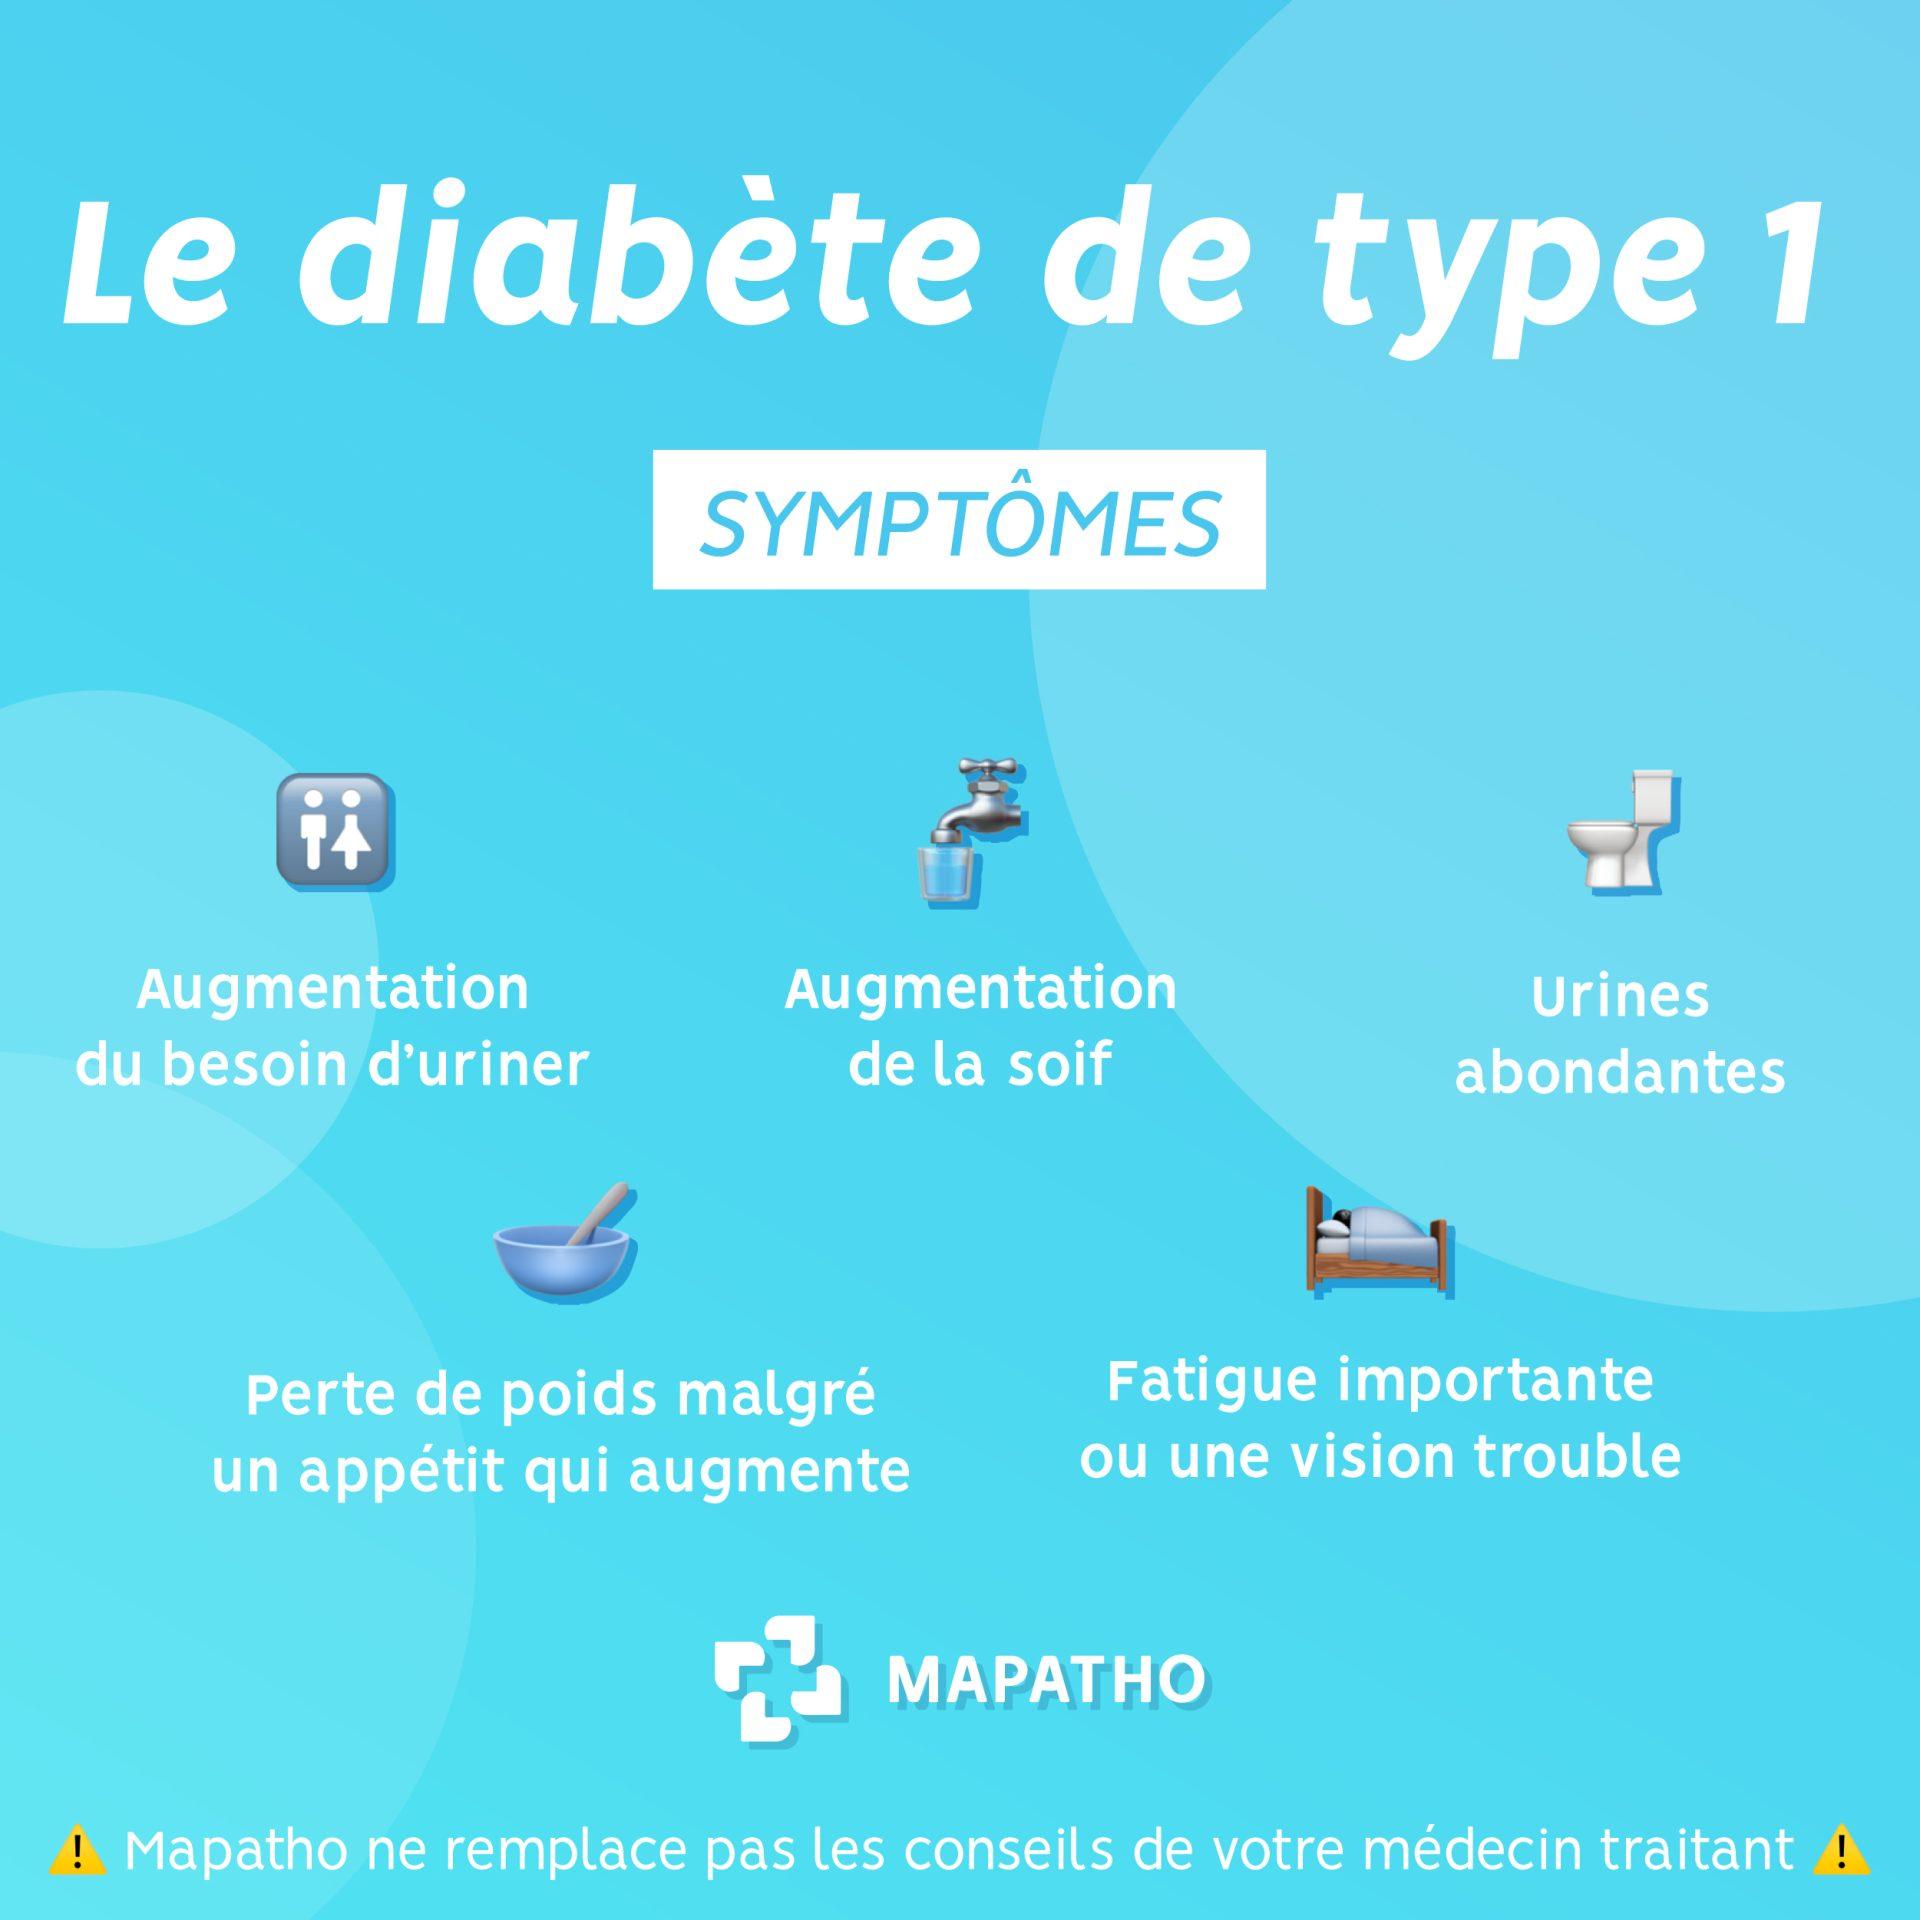 Les symptomes  du diabete de type 1